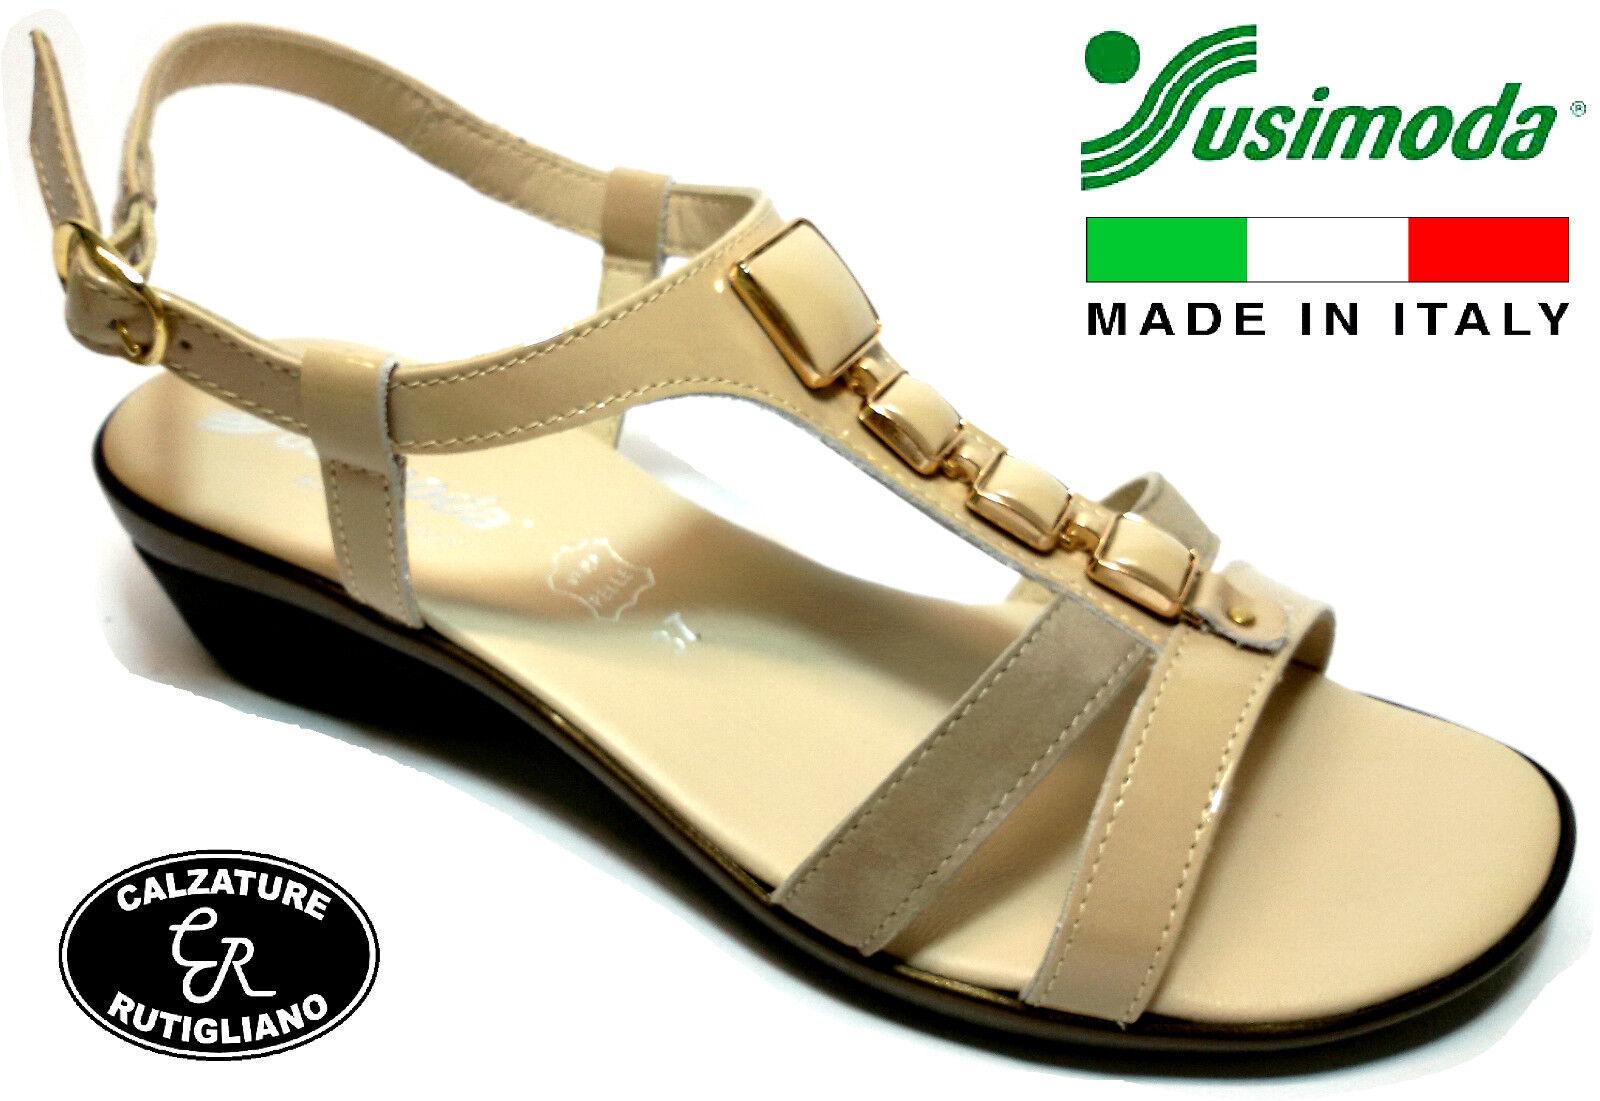 SUSIMODA 254426 chaussures femmes SANDALI LINEA COMODA VERNICE PELLE MADE IN ITALY